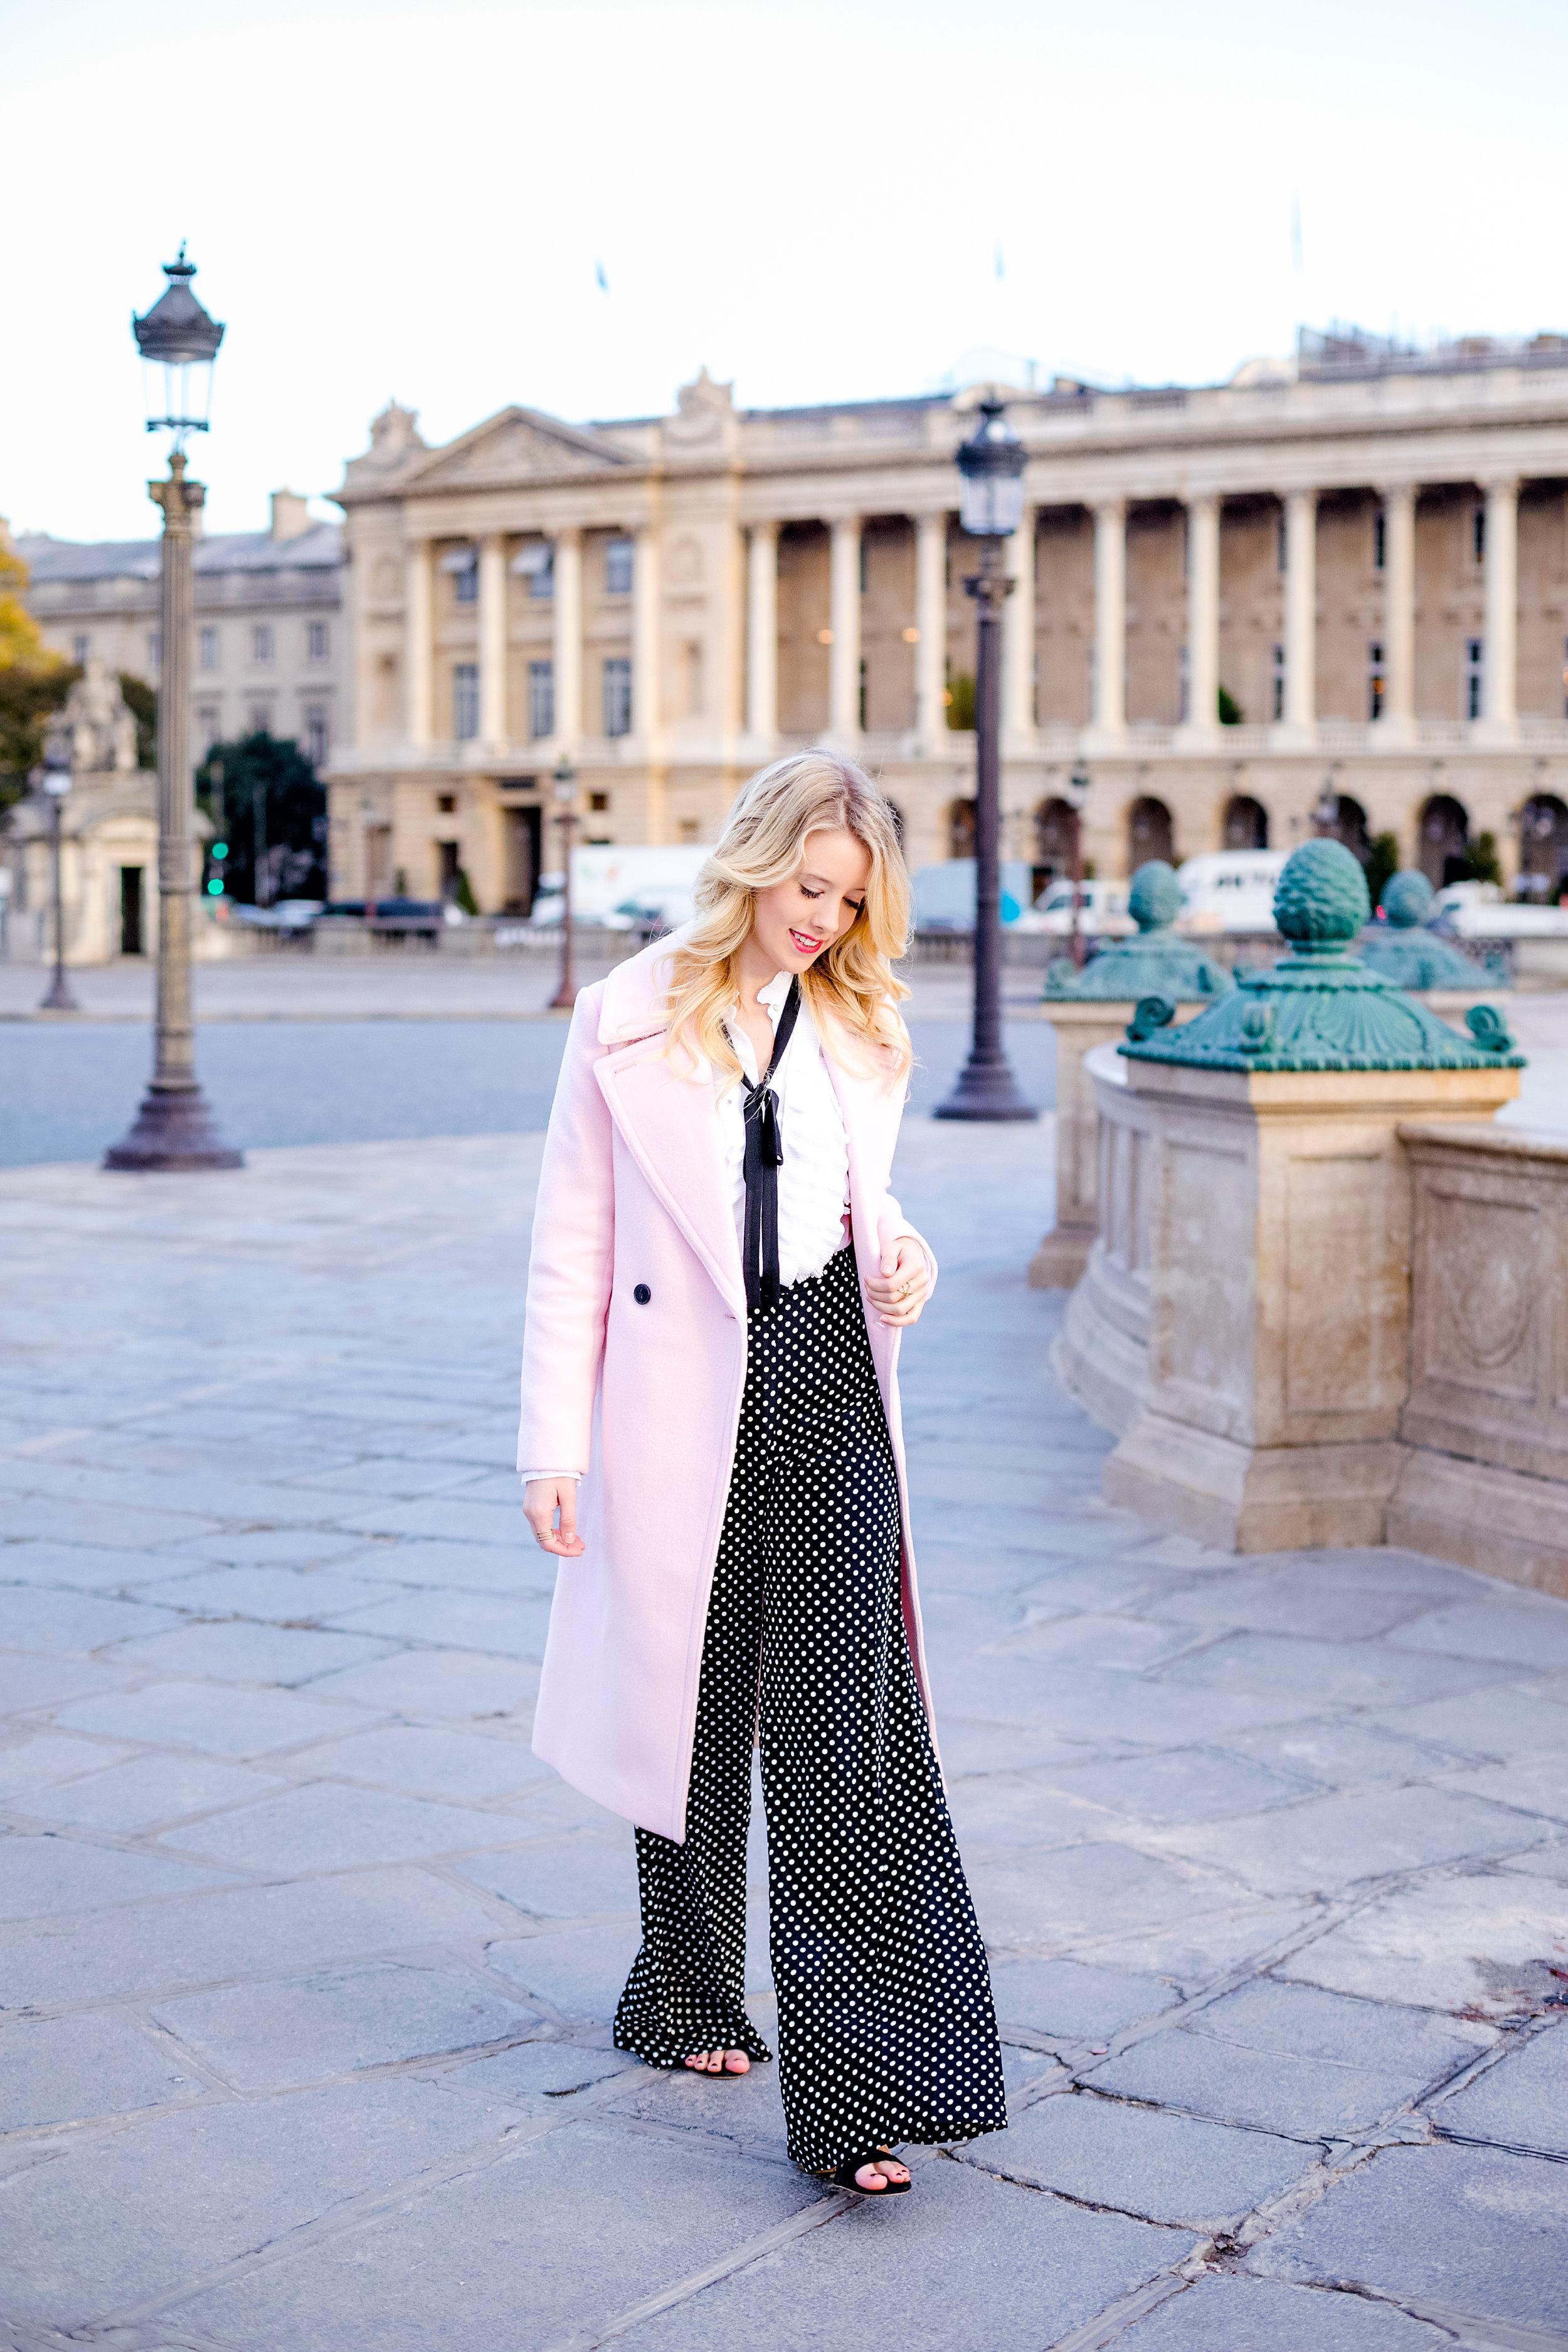 Paris_Emily3-2.jpg